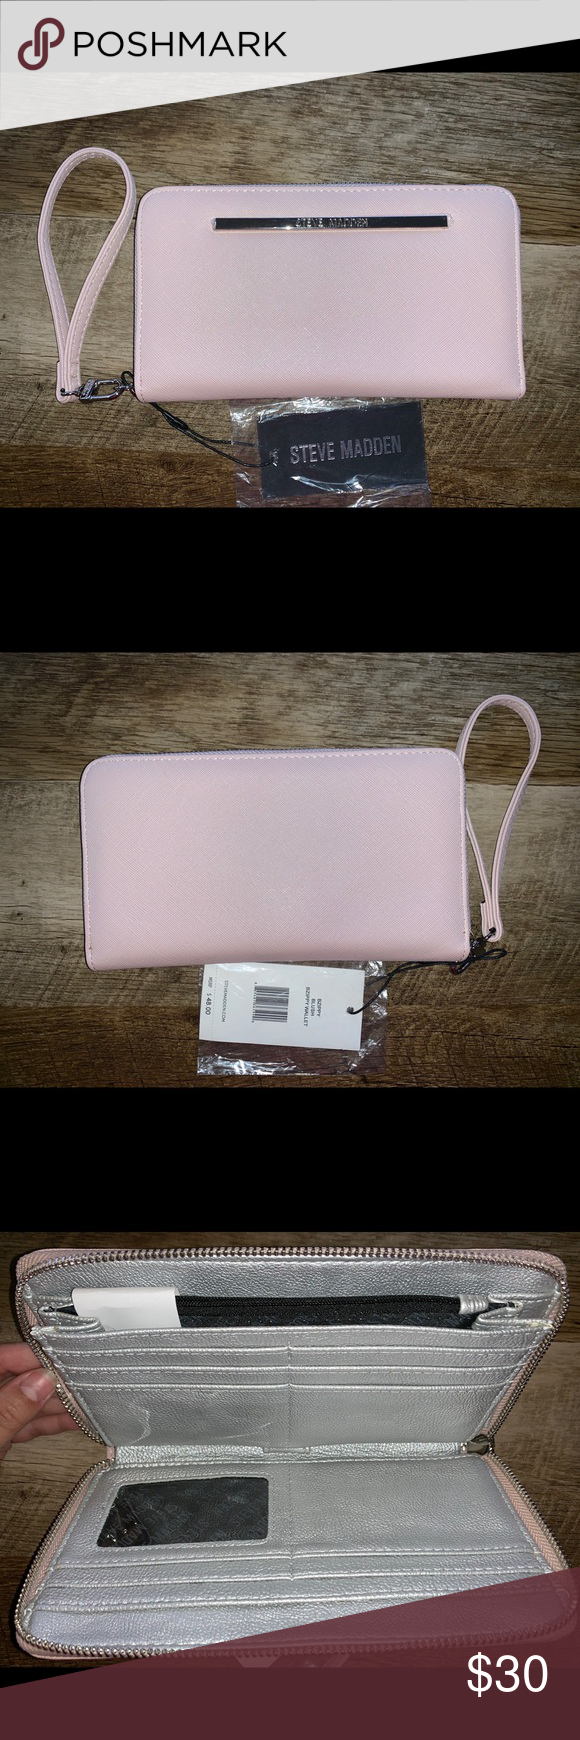 Steve Madden Zippy Wallet New light blush color, inter